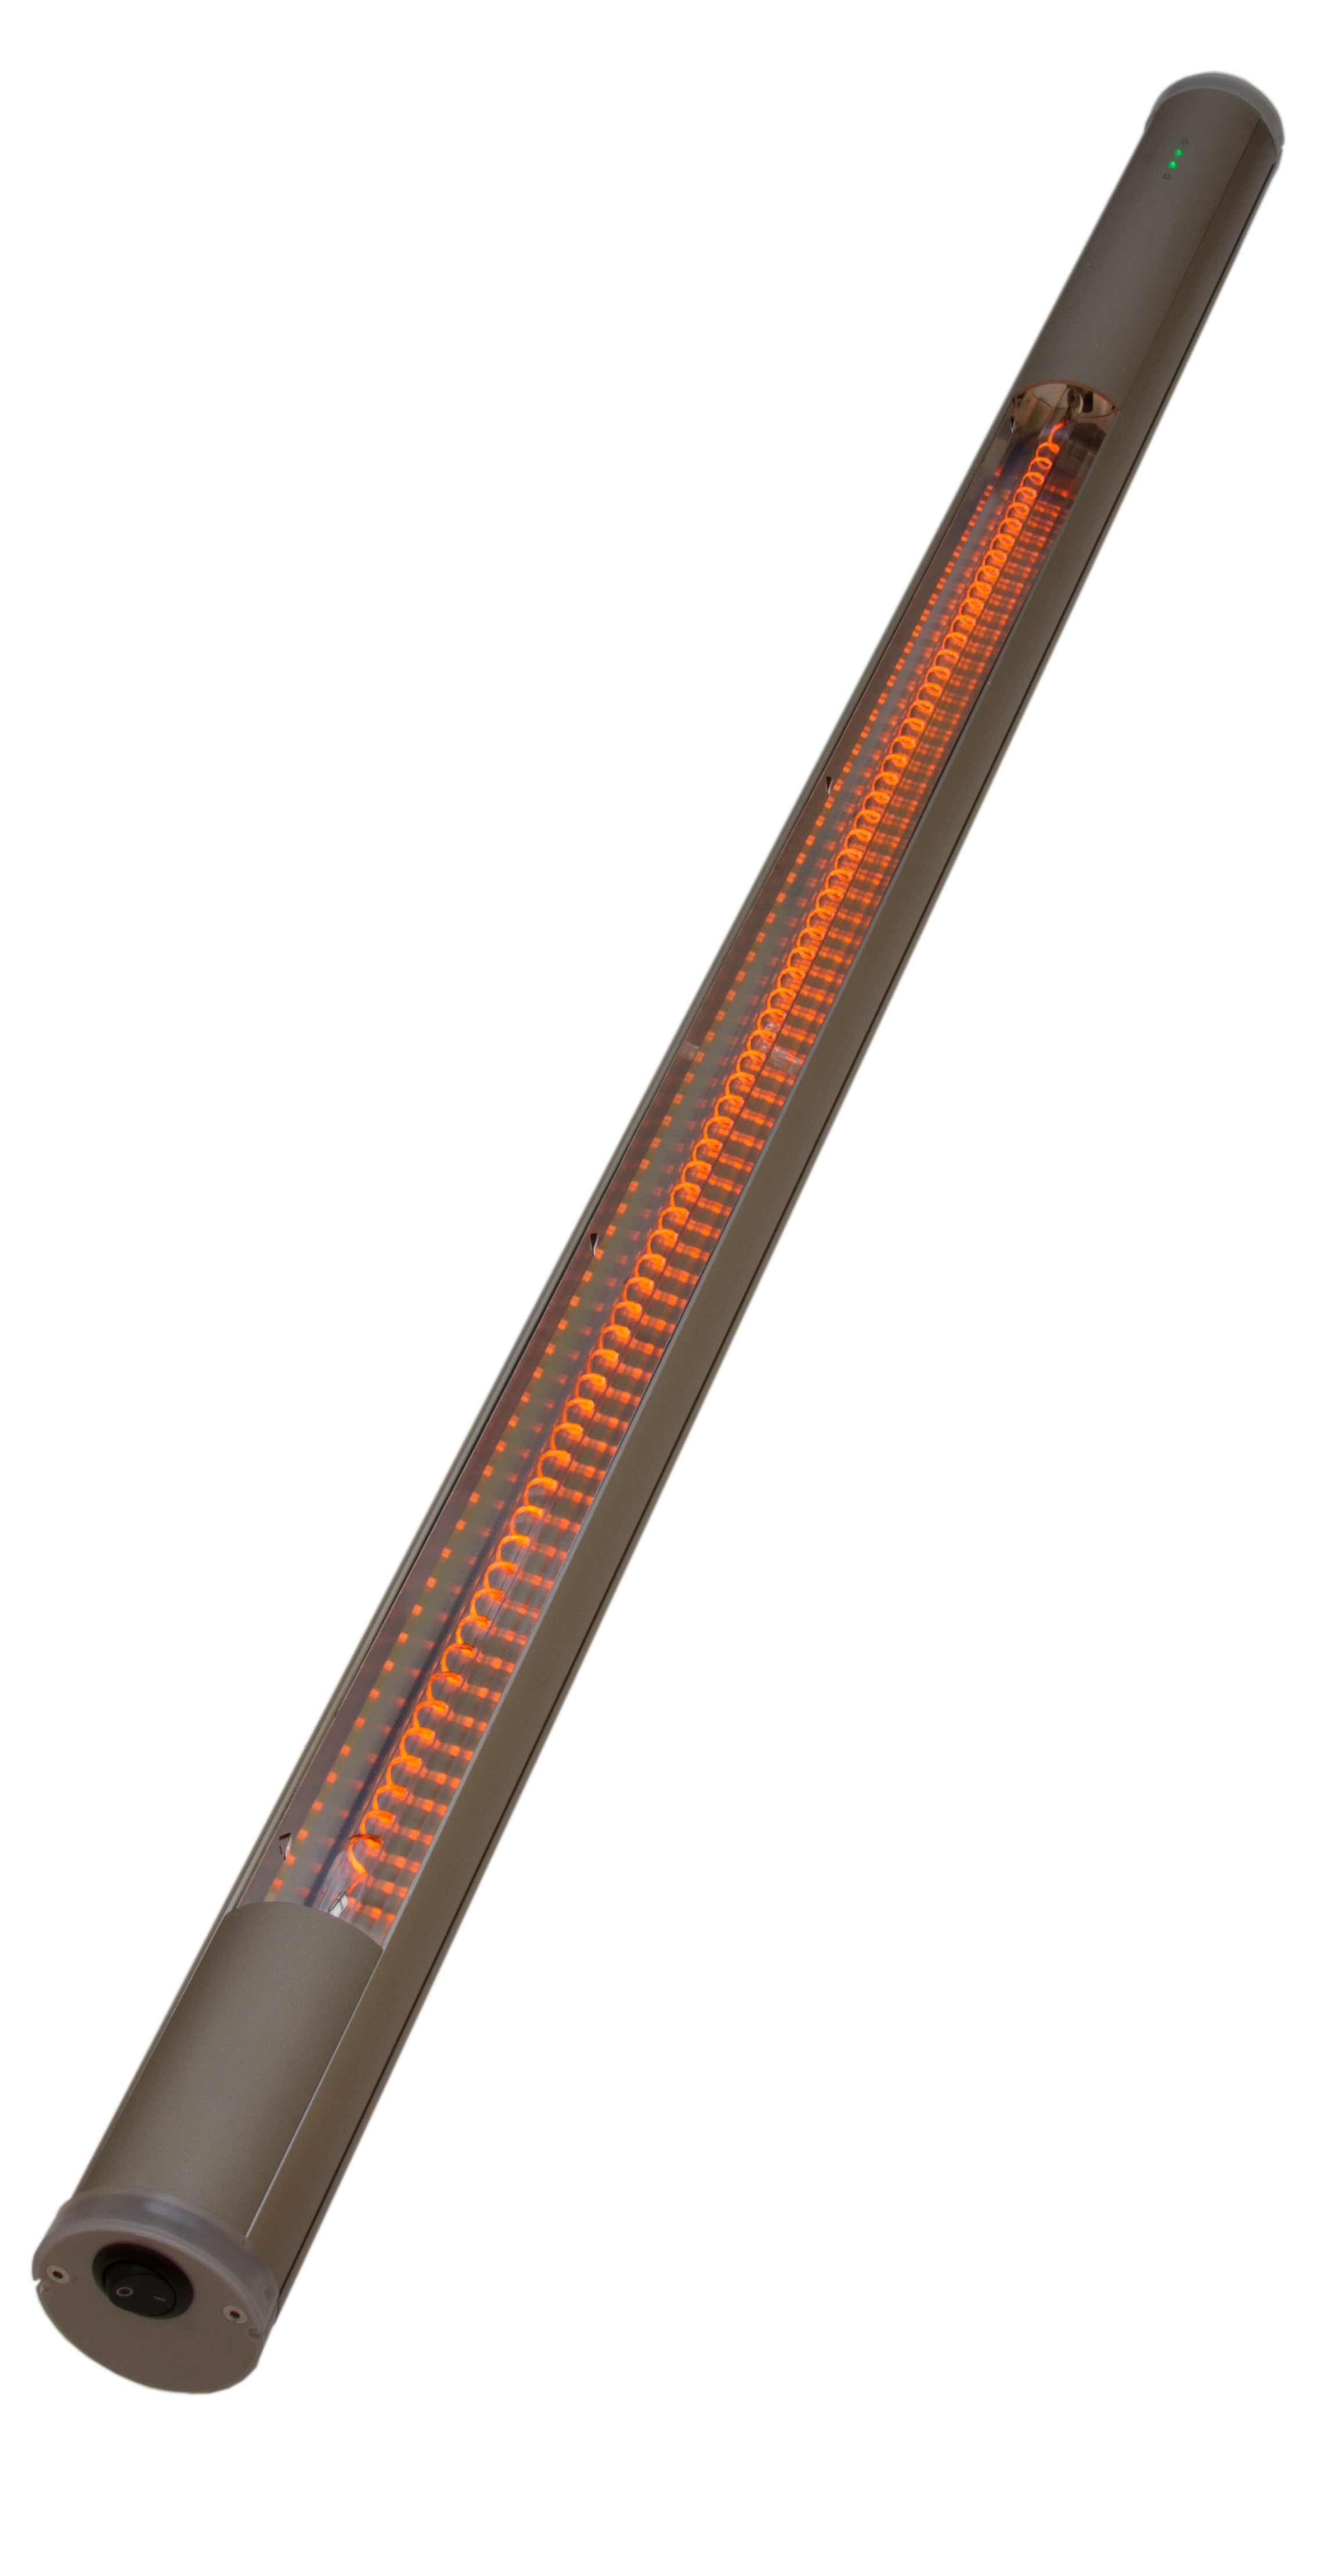 ExtremeLine Carbonstrahler HEAT TUBE (1m) 900W